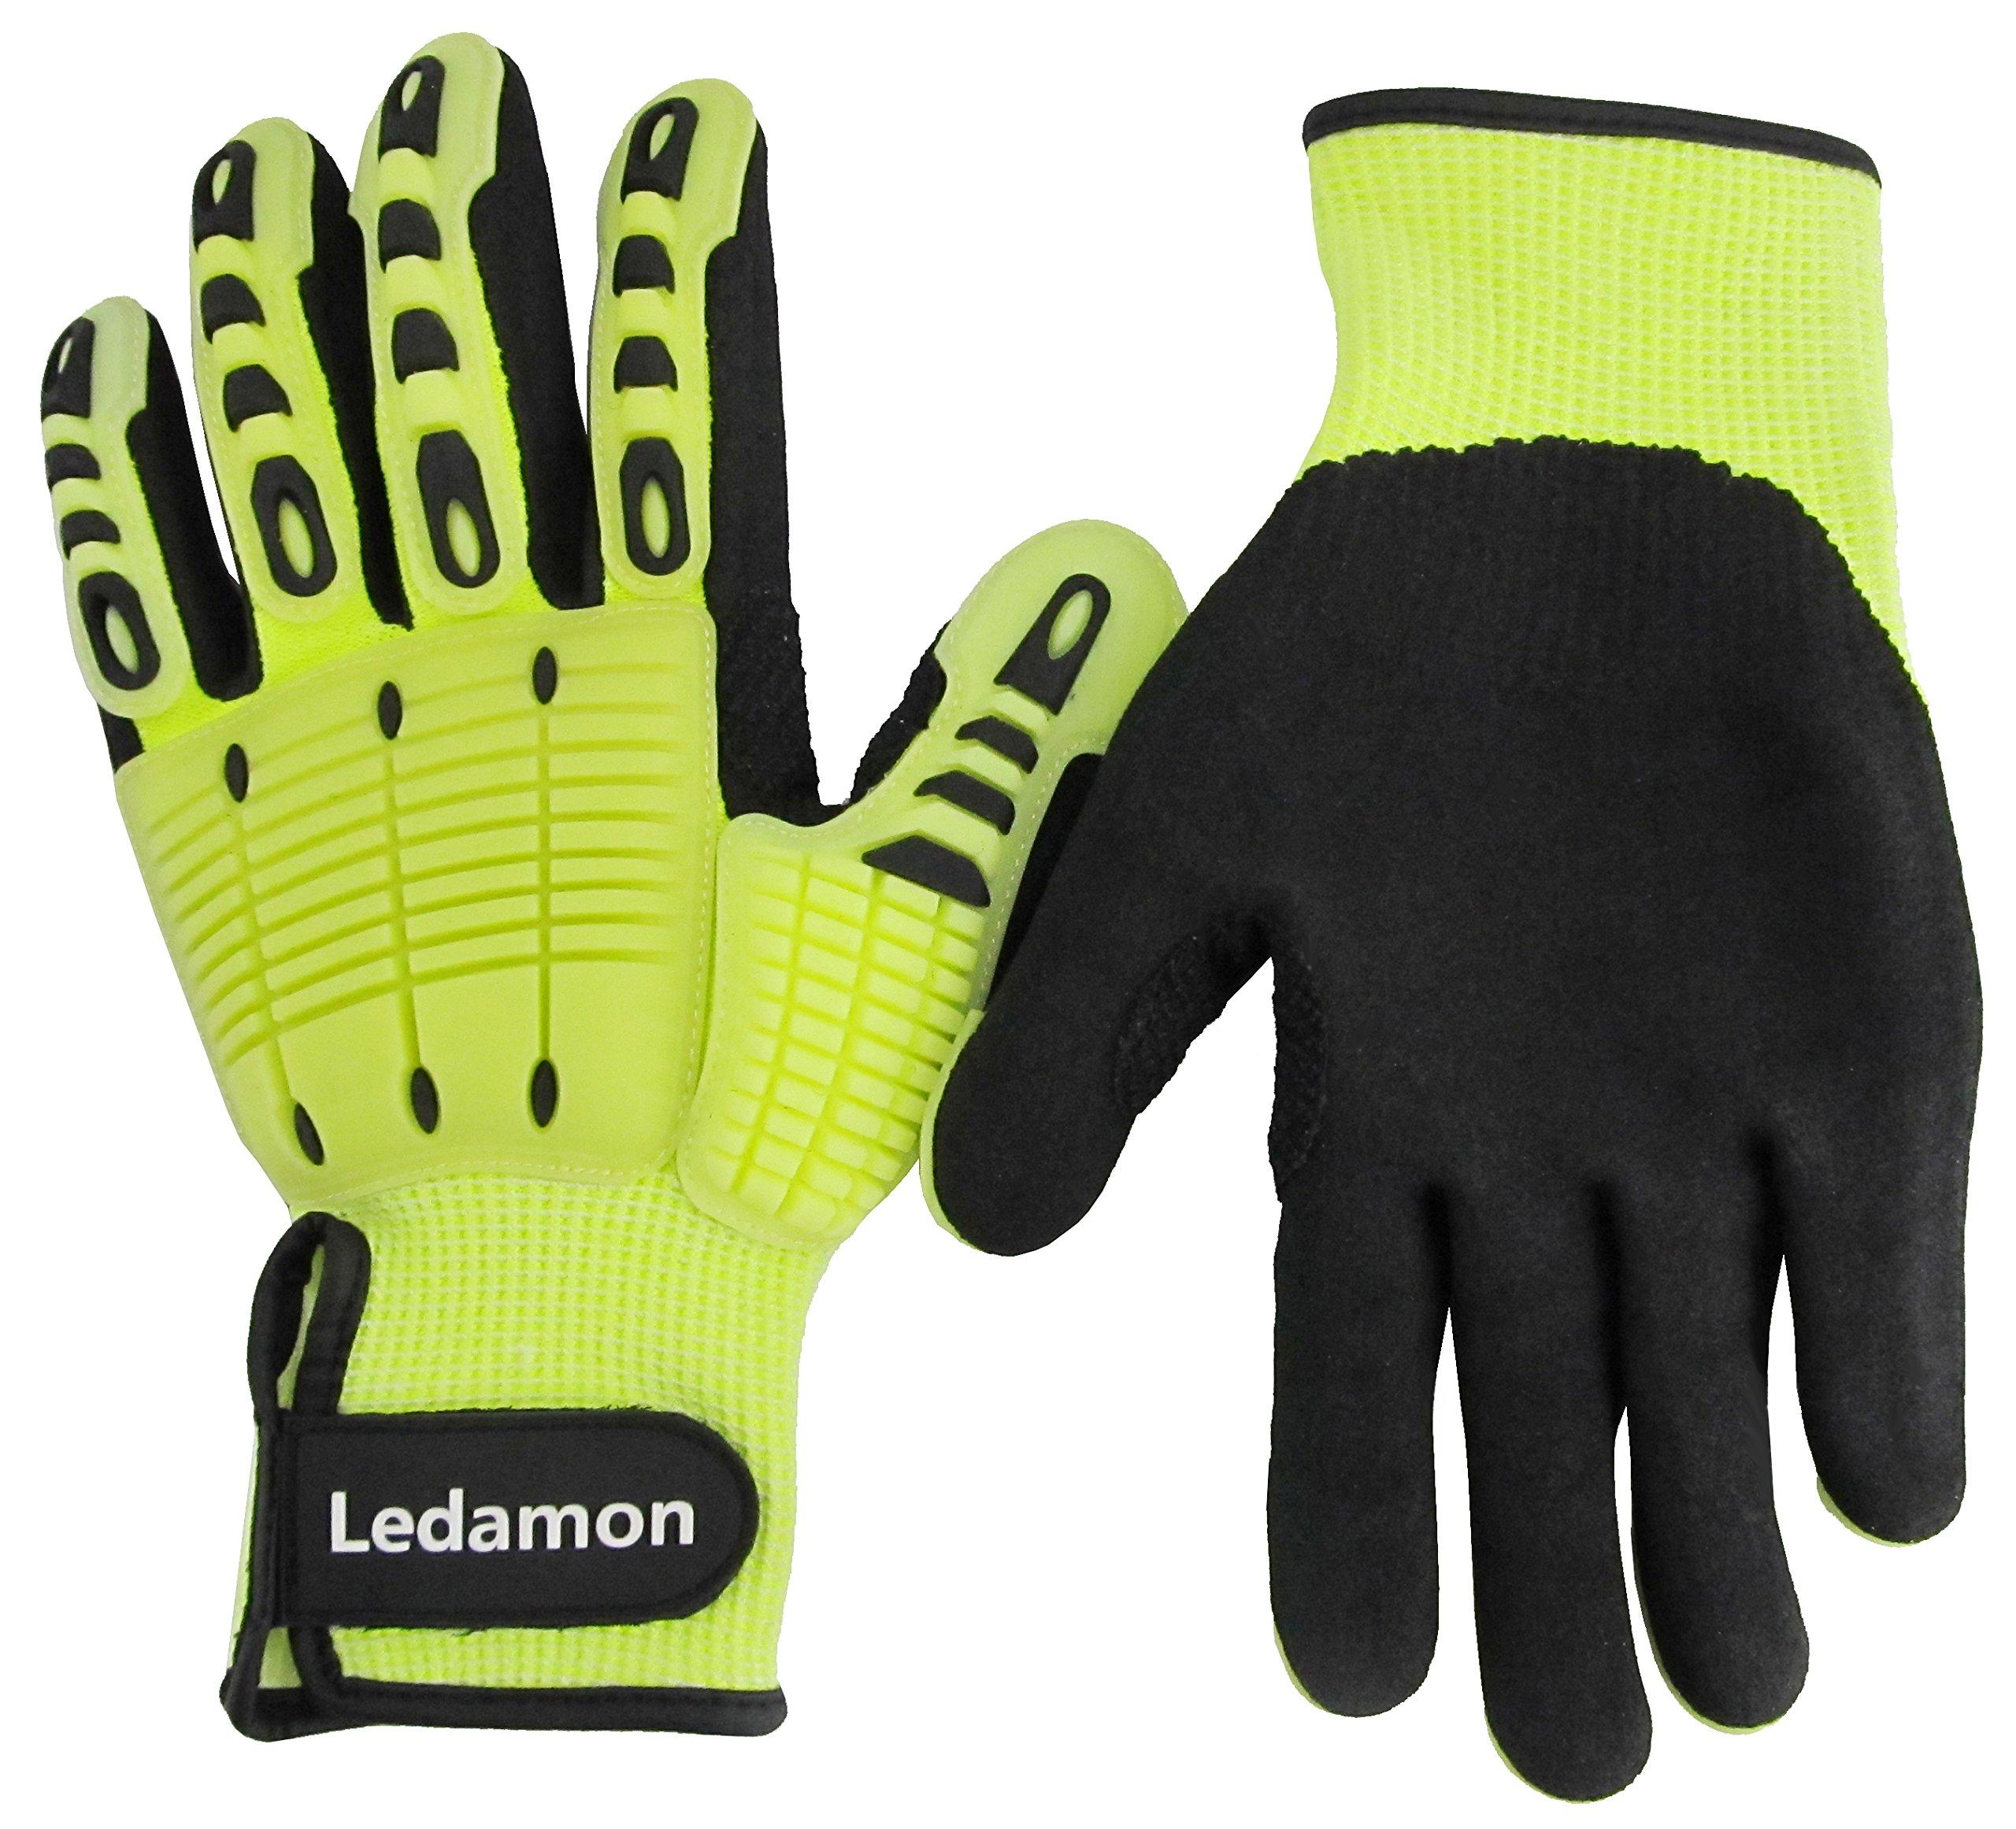 Ledamon Anti-Vibration Impact Resistant Cut Resistant Wear Resistant Mechanic Work Gloves Professional-Grade Protection & Durability (XX-Large)